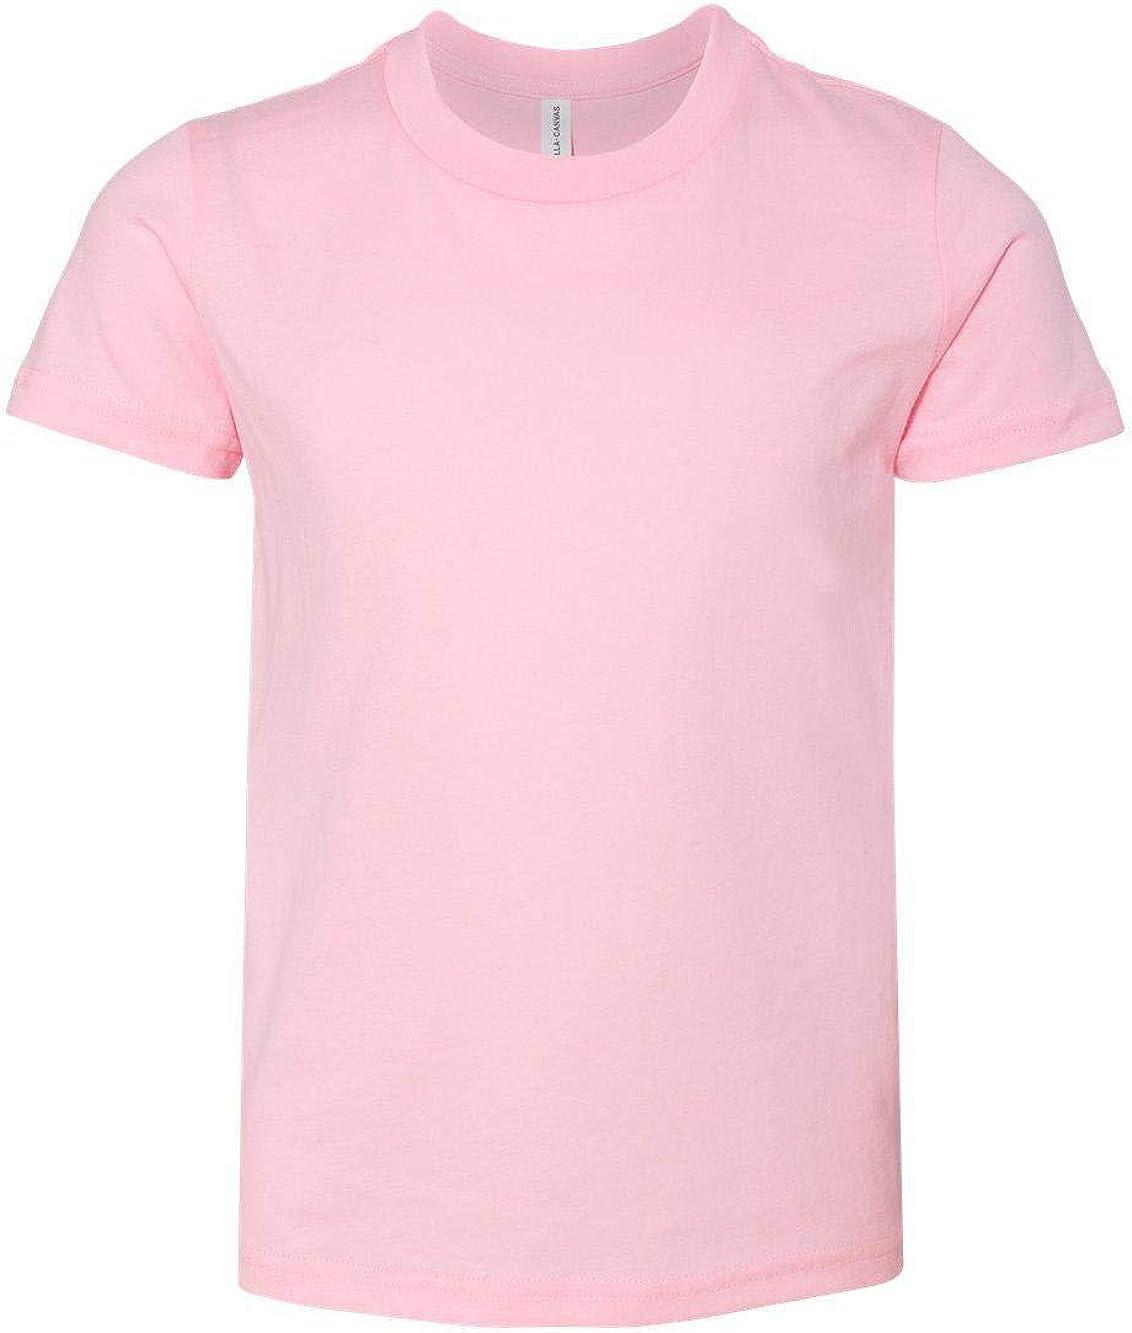 Kids Polycotton Short Sleeve Tee Bella Canvas Toddler Triblend T-shirt 3413T